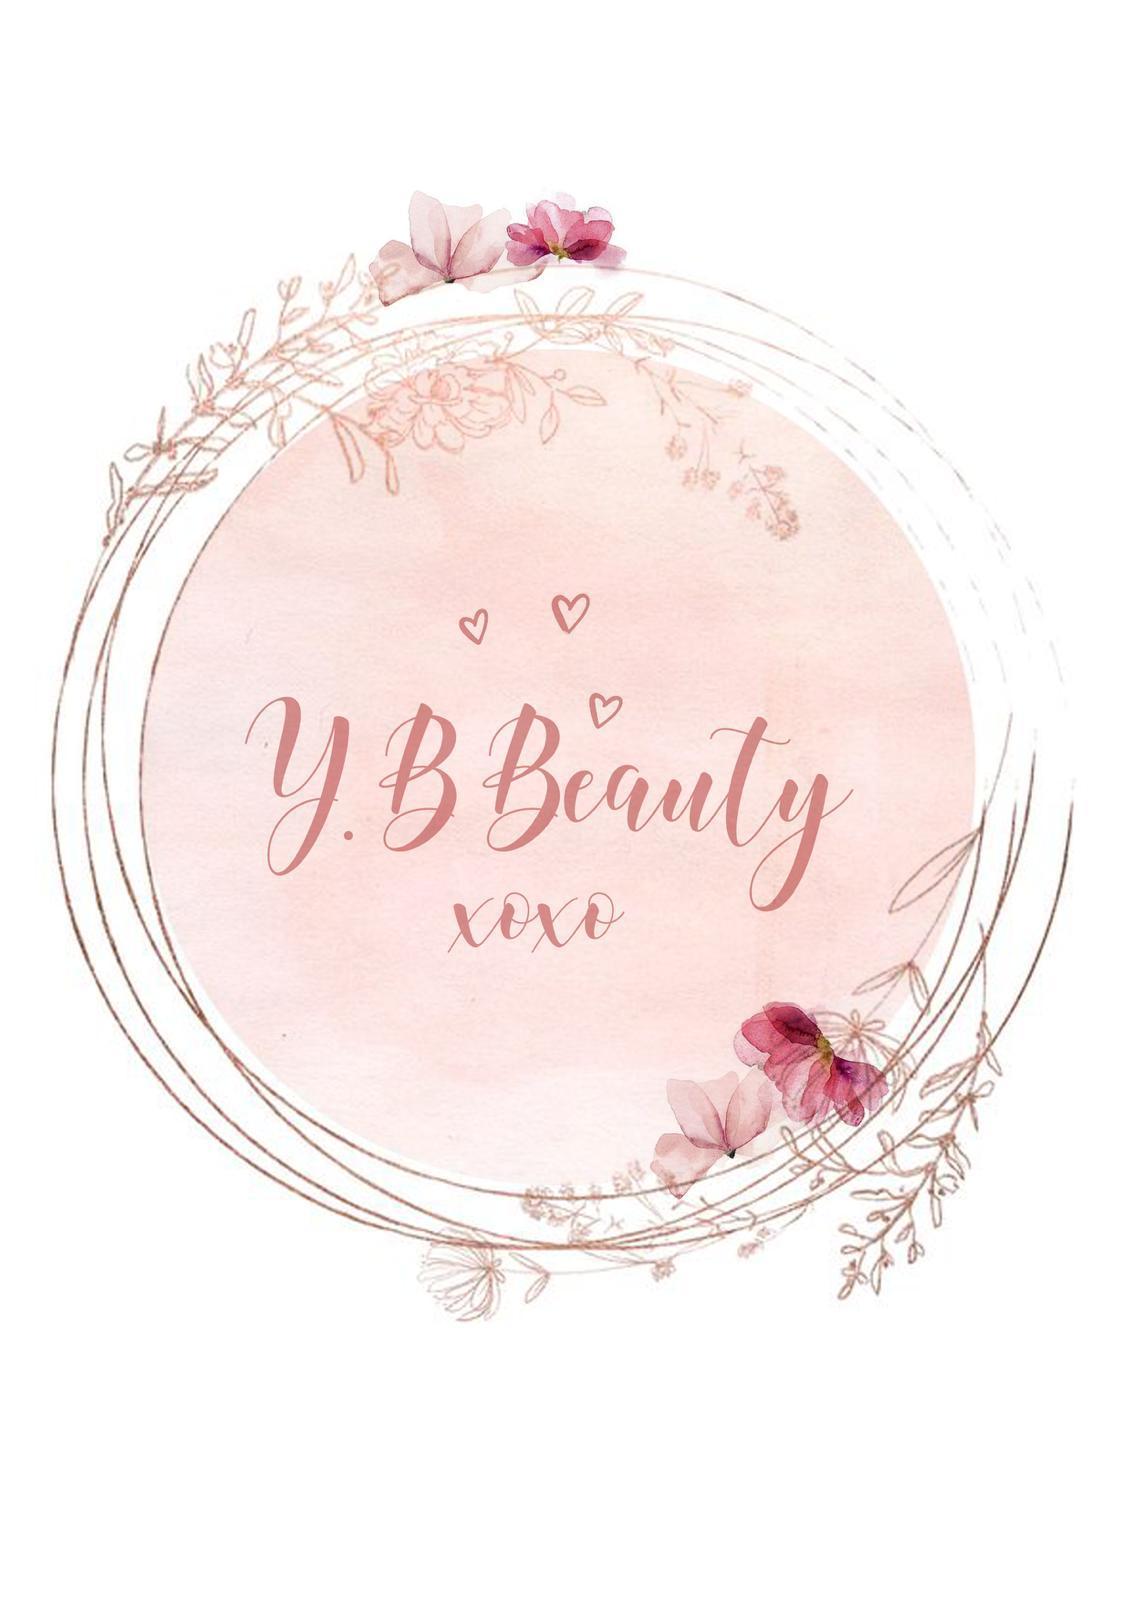 YB Beauty